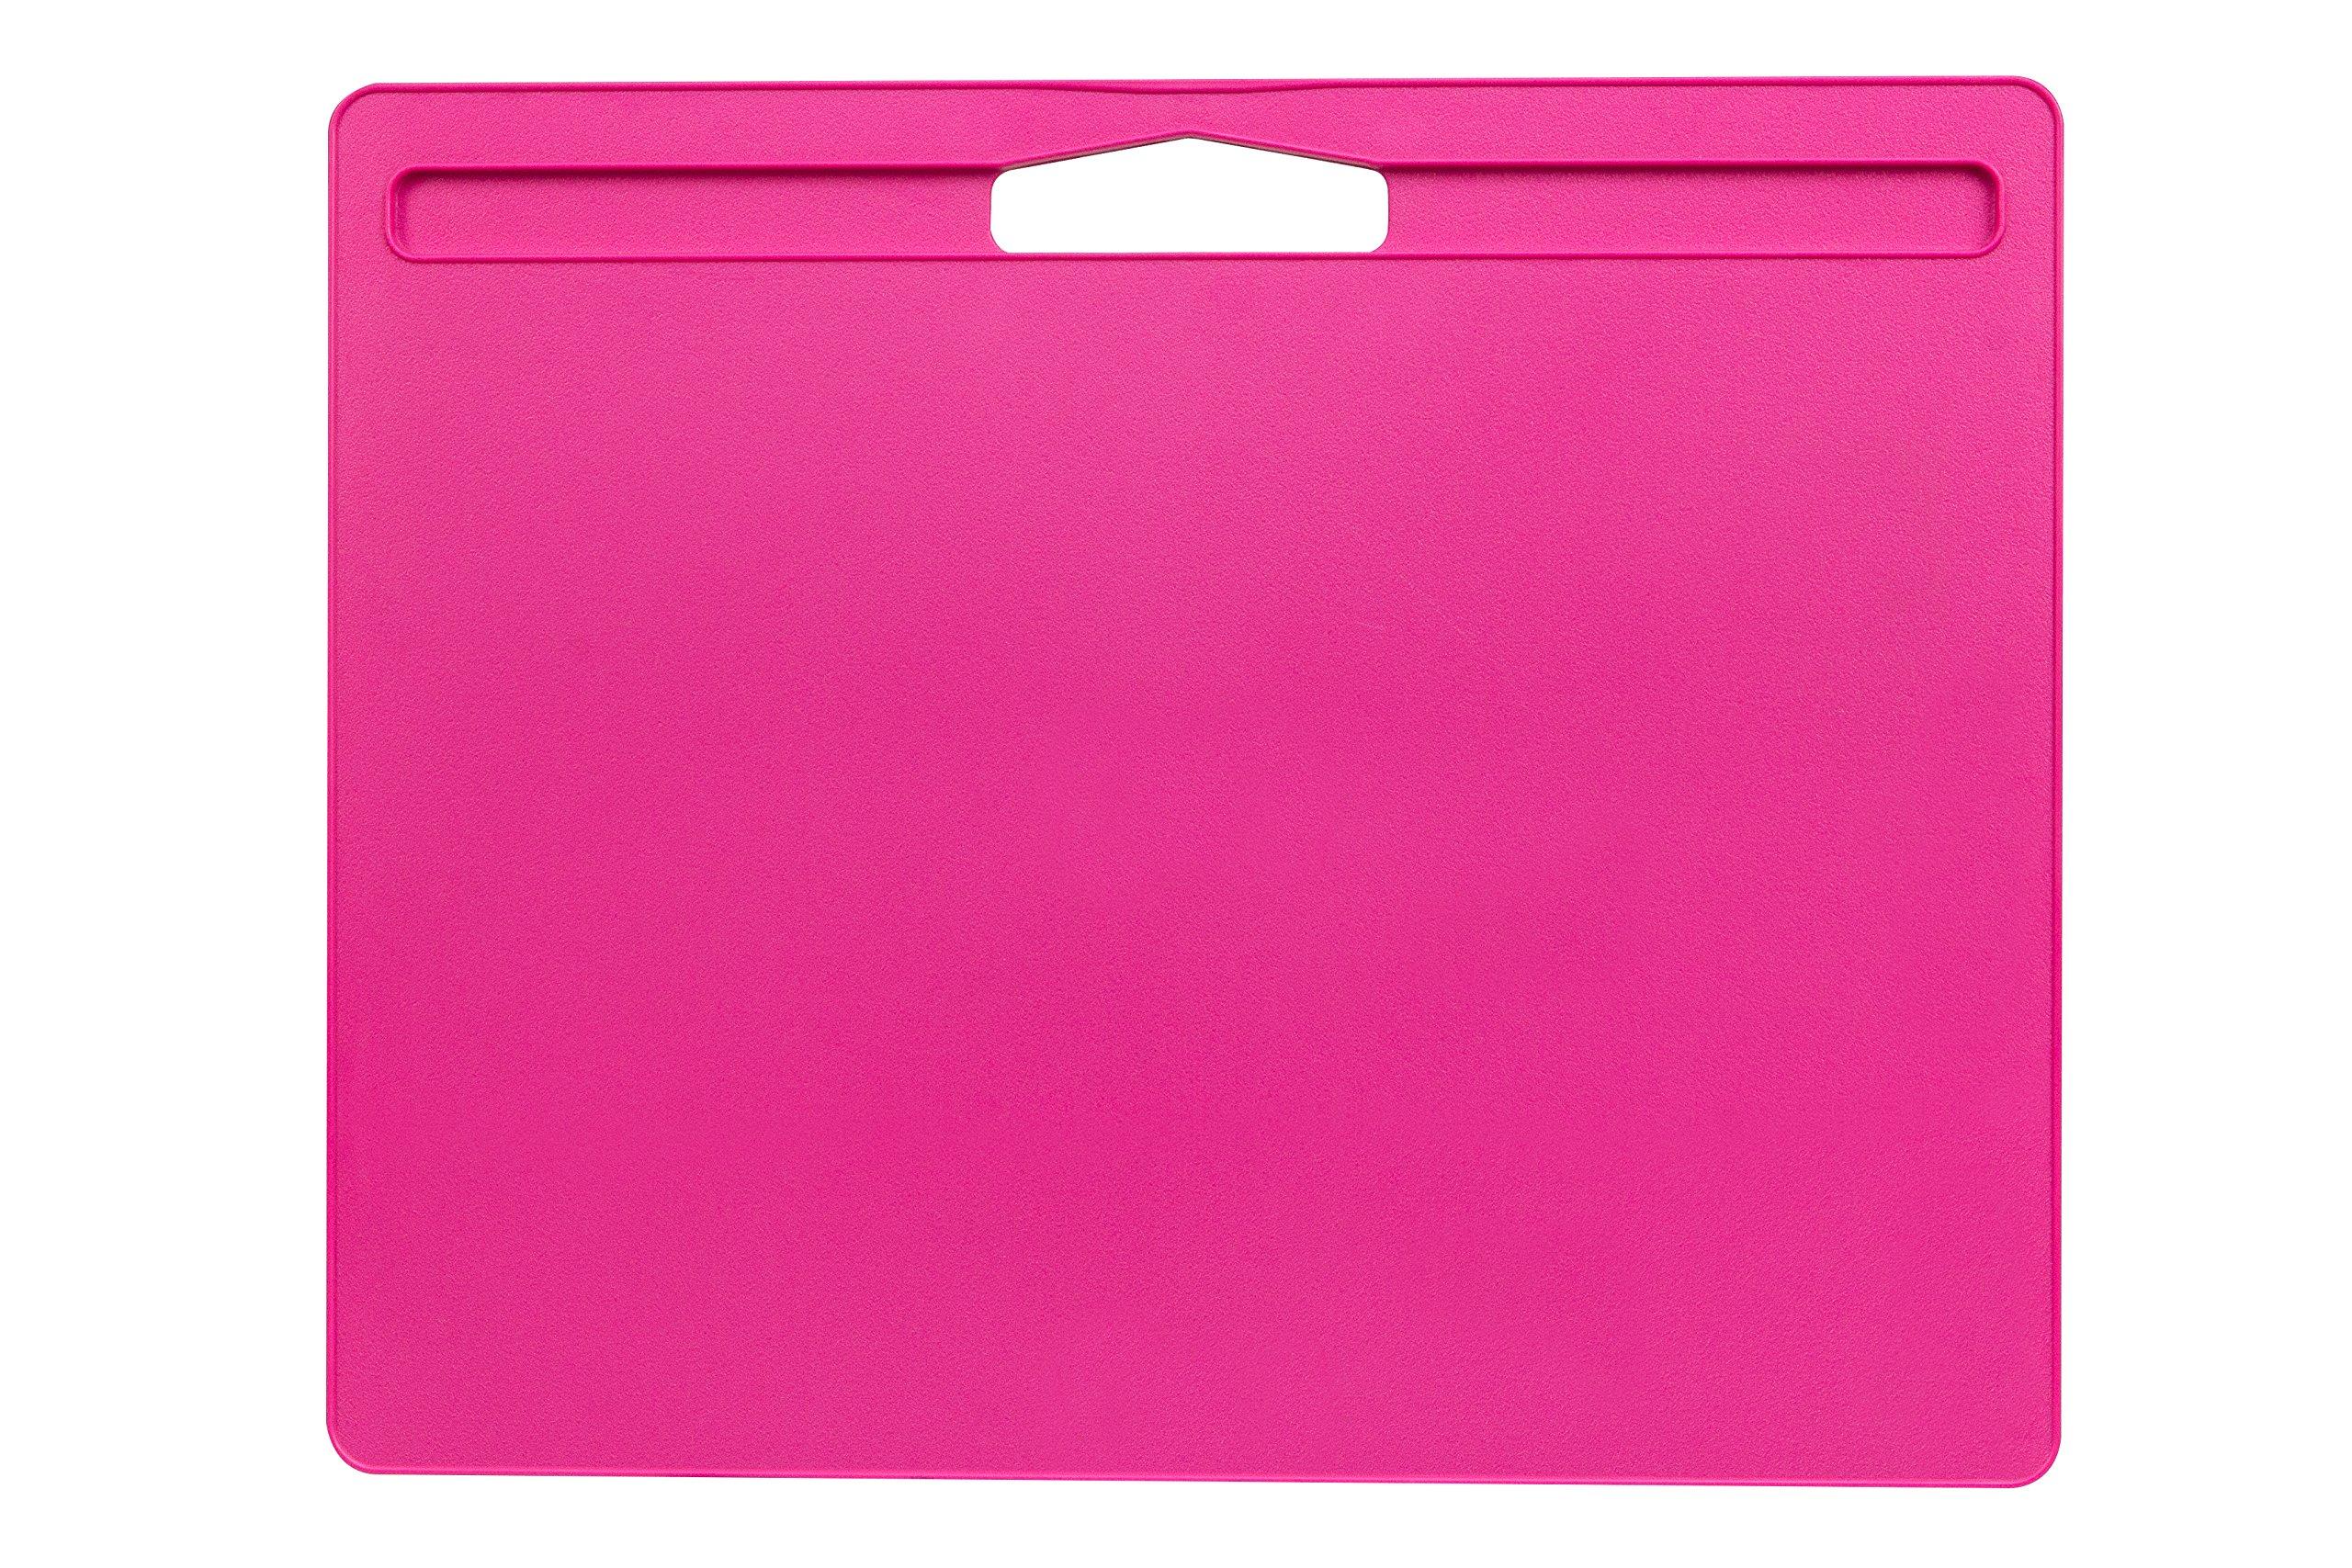 LapGear Student LapDesk 45017 Pink by Lap Desk (Image #3)